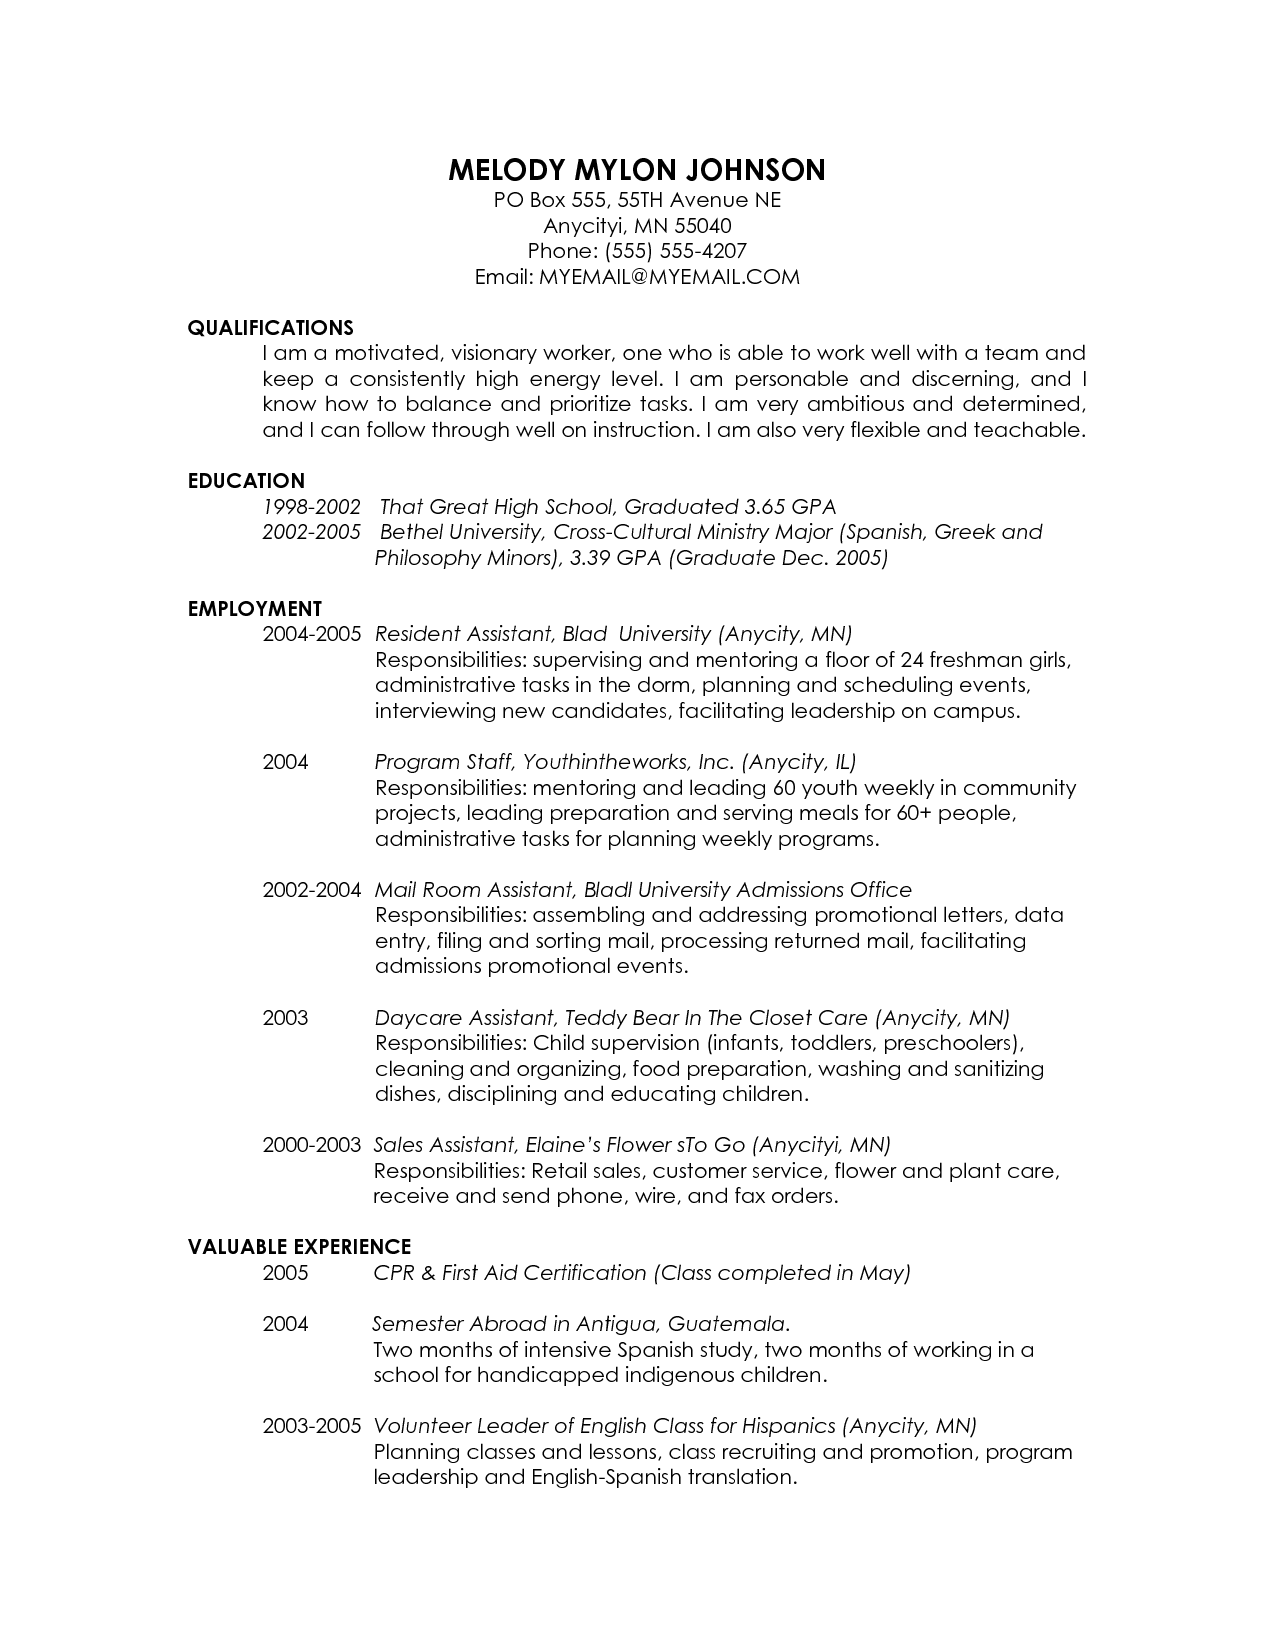 Resume Format Graduate School